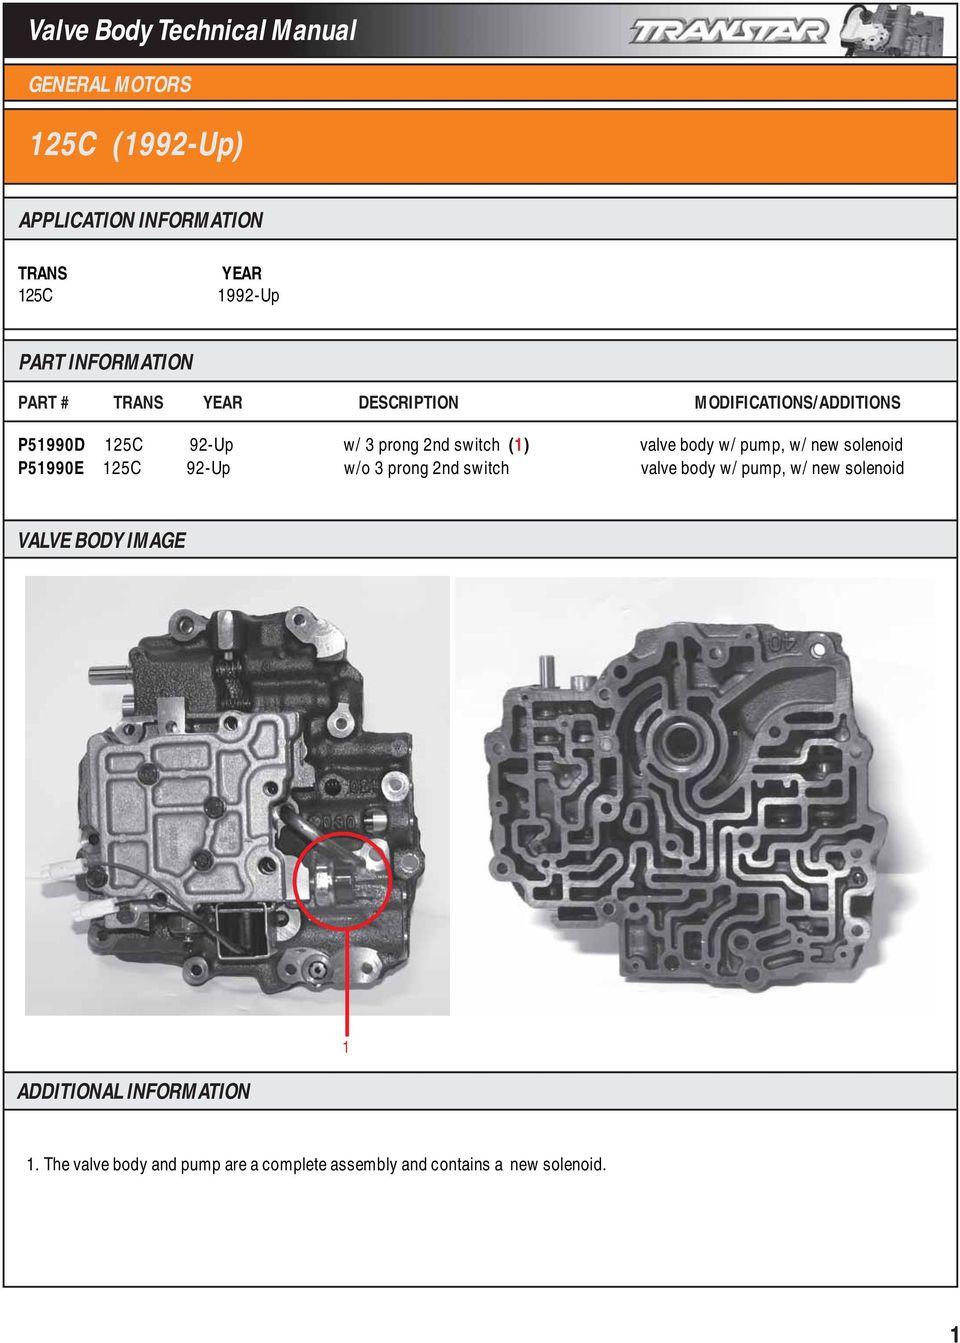 medium resolution of w o 3 prong 2nd switch valve body w pump w new